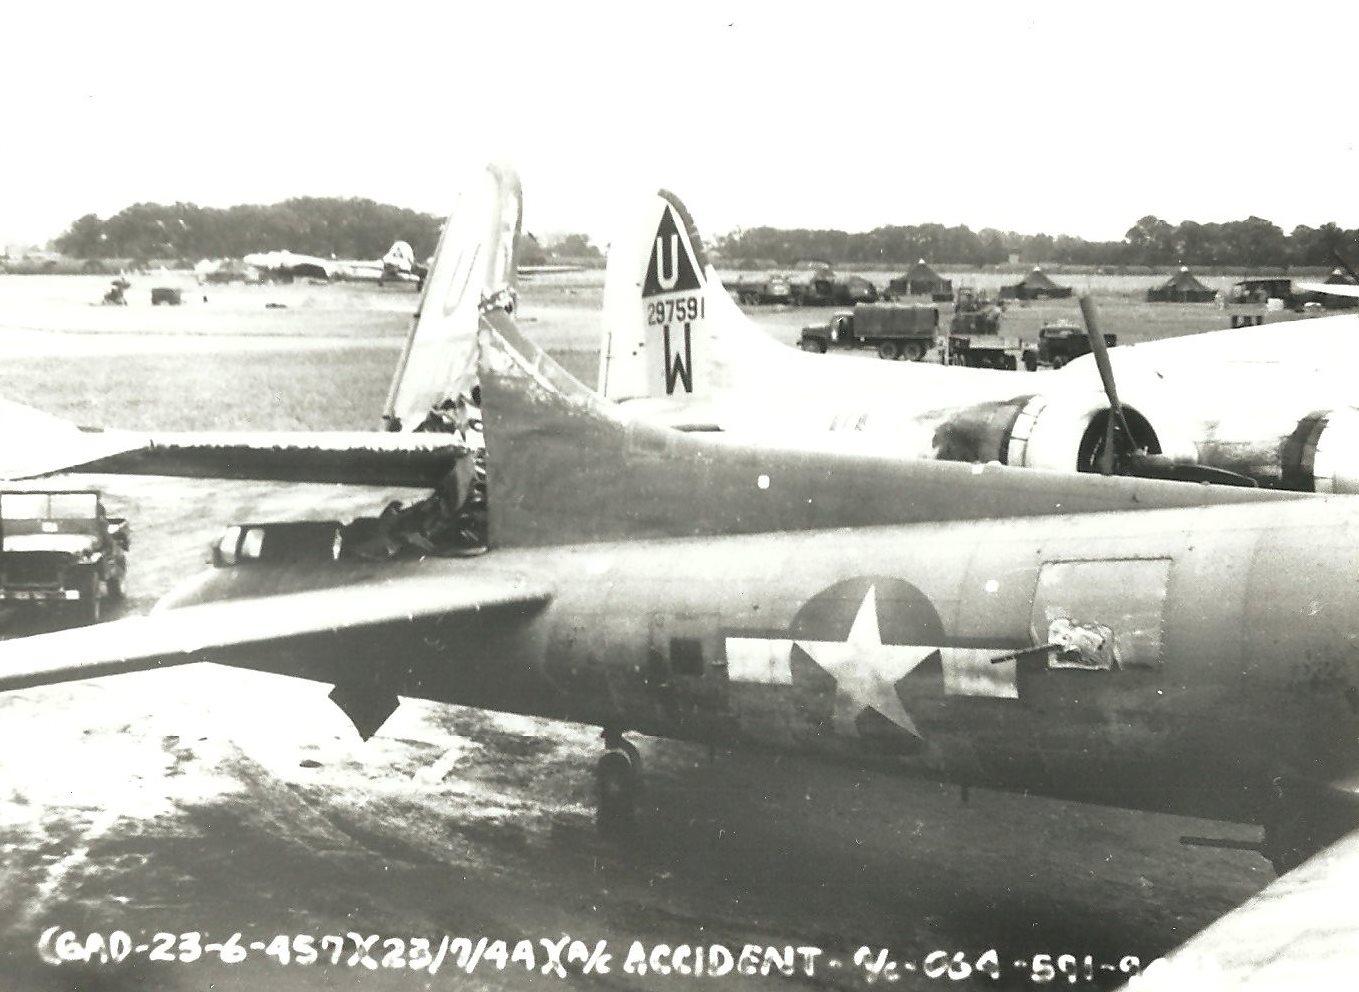 B-17 #42-97591